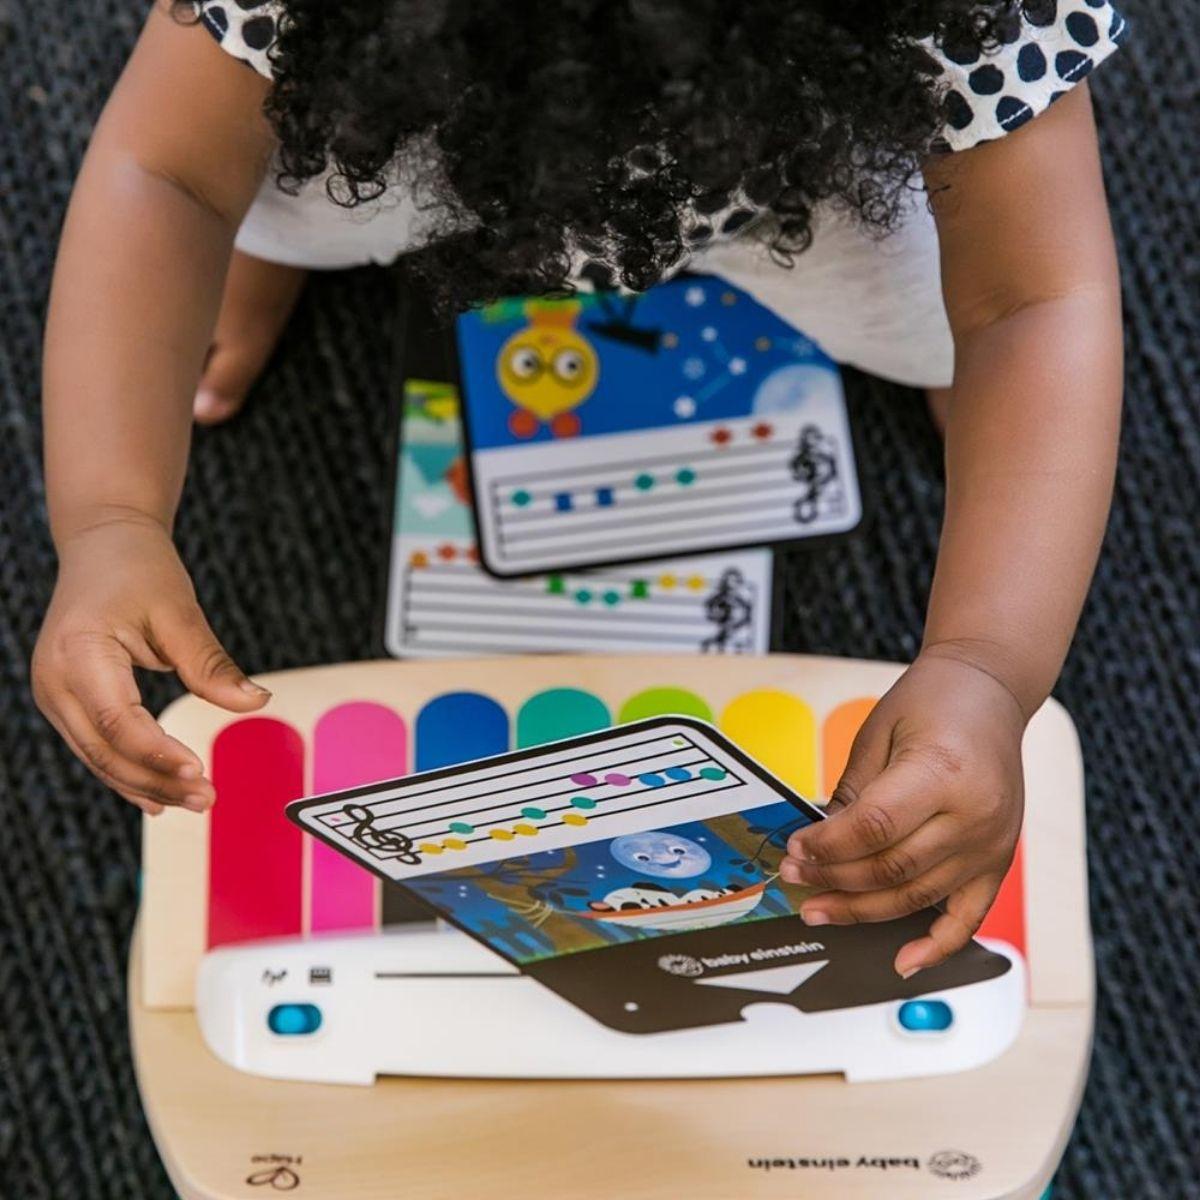 Piano Musical Infantil em Madeira Magic Touch Hape Baby Einstein